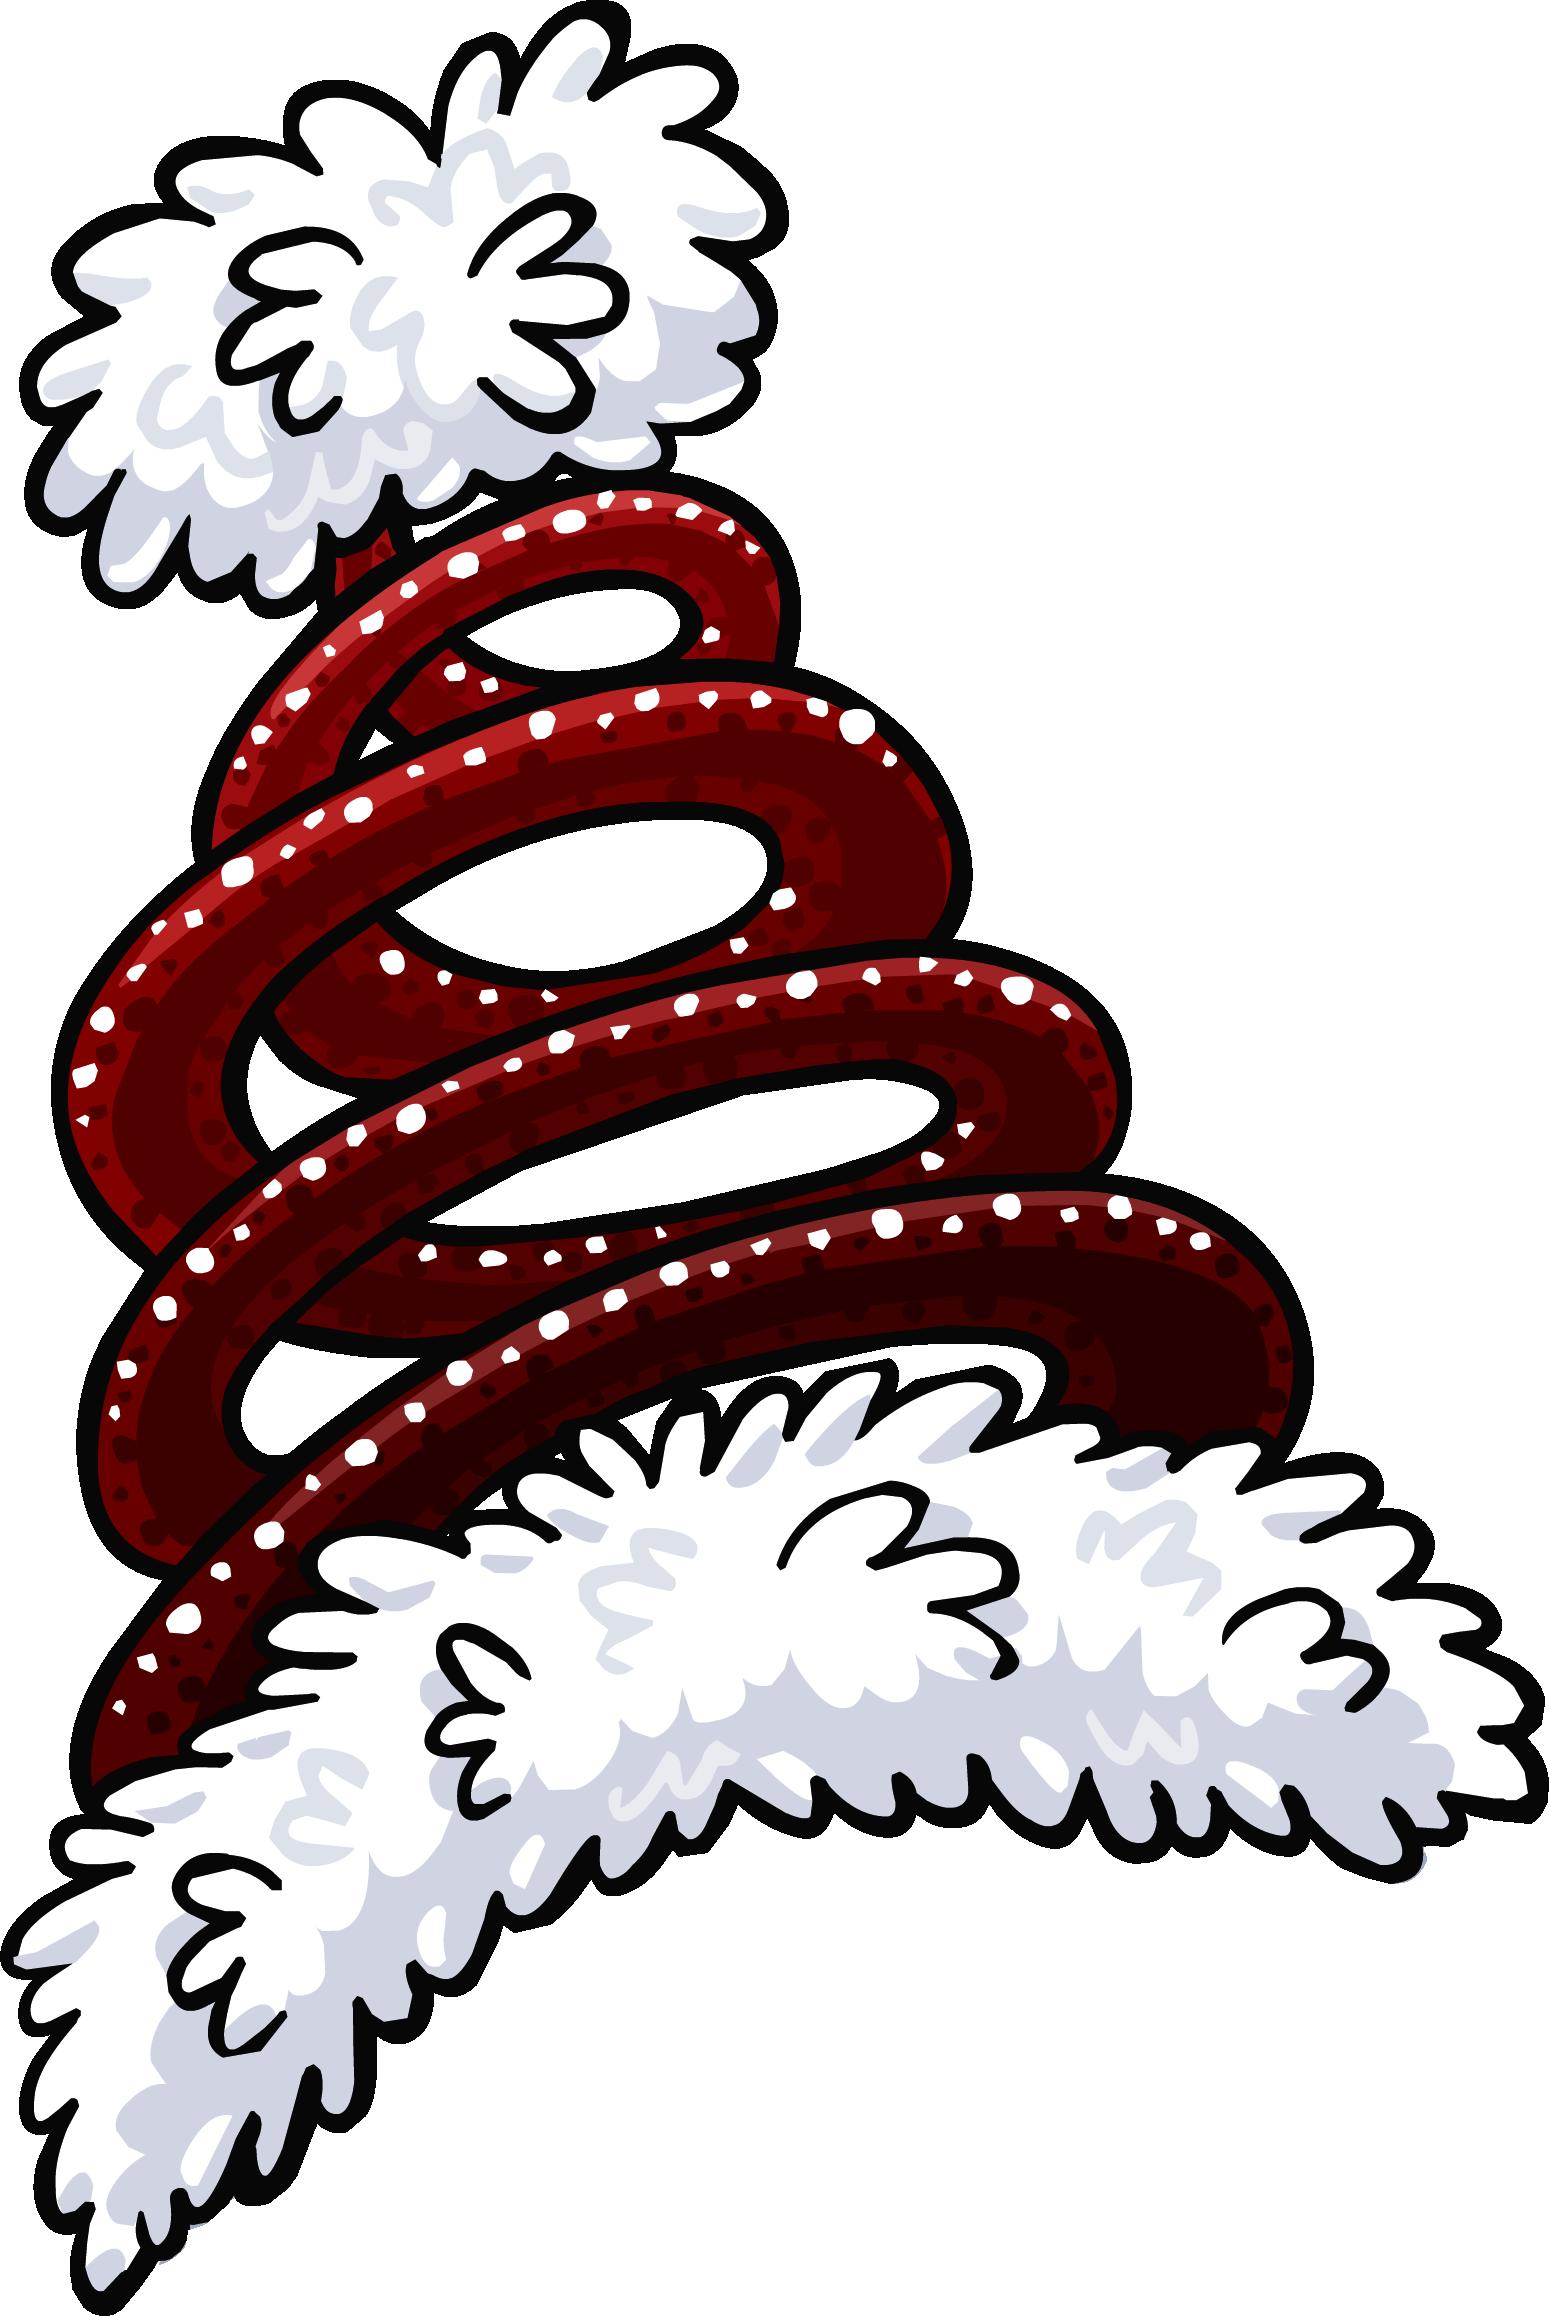 Image springy santa hat club penguin wiki the